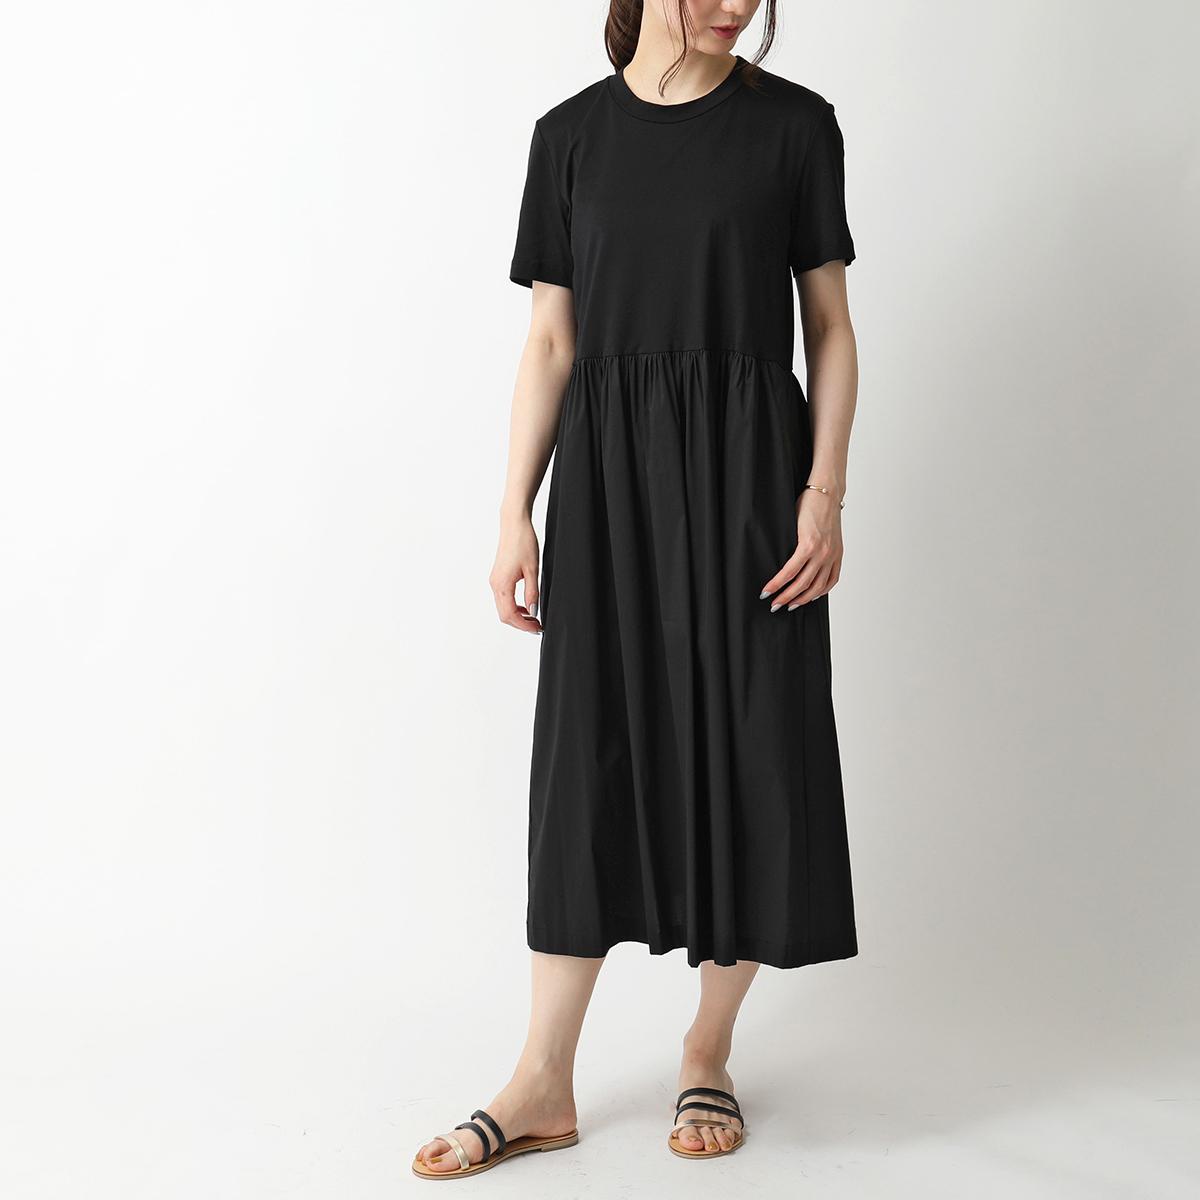 Liviana Conti リビアナコンティ L0SH46 切り替え 半袖 Tシャツ コットン ポプリン シャツ ワンピース Y69-0/ブラック レディース